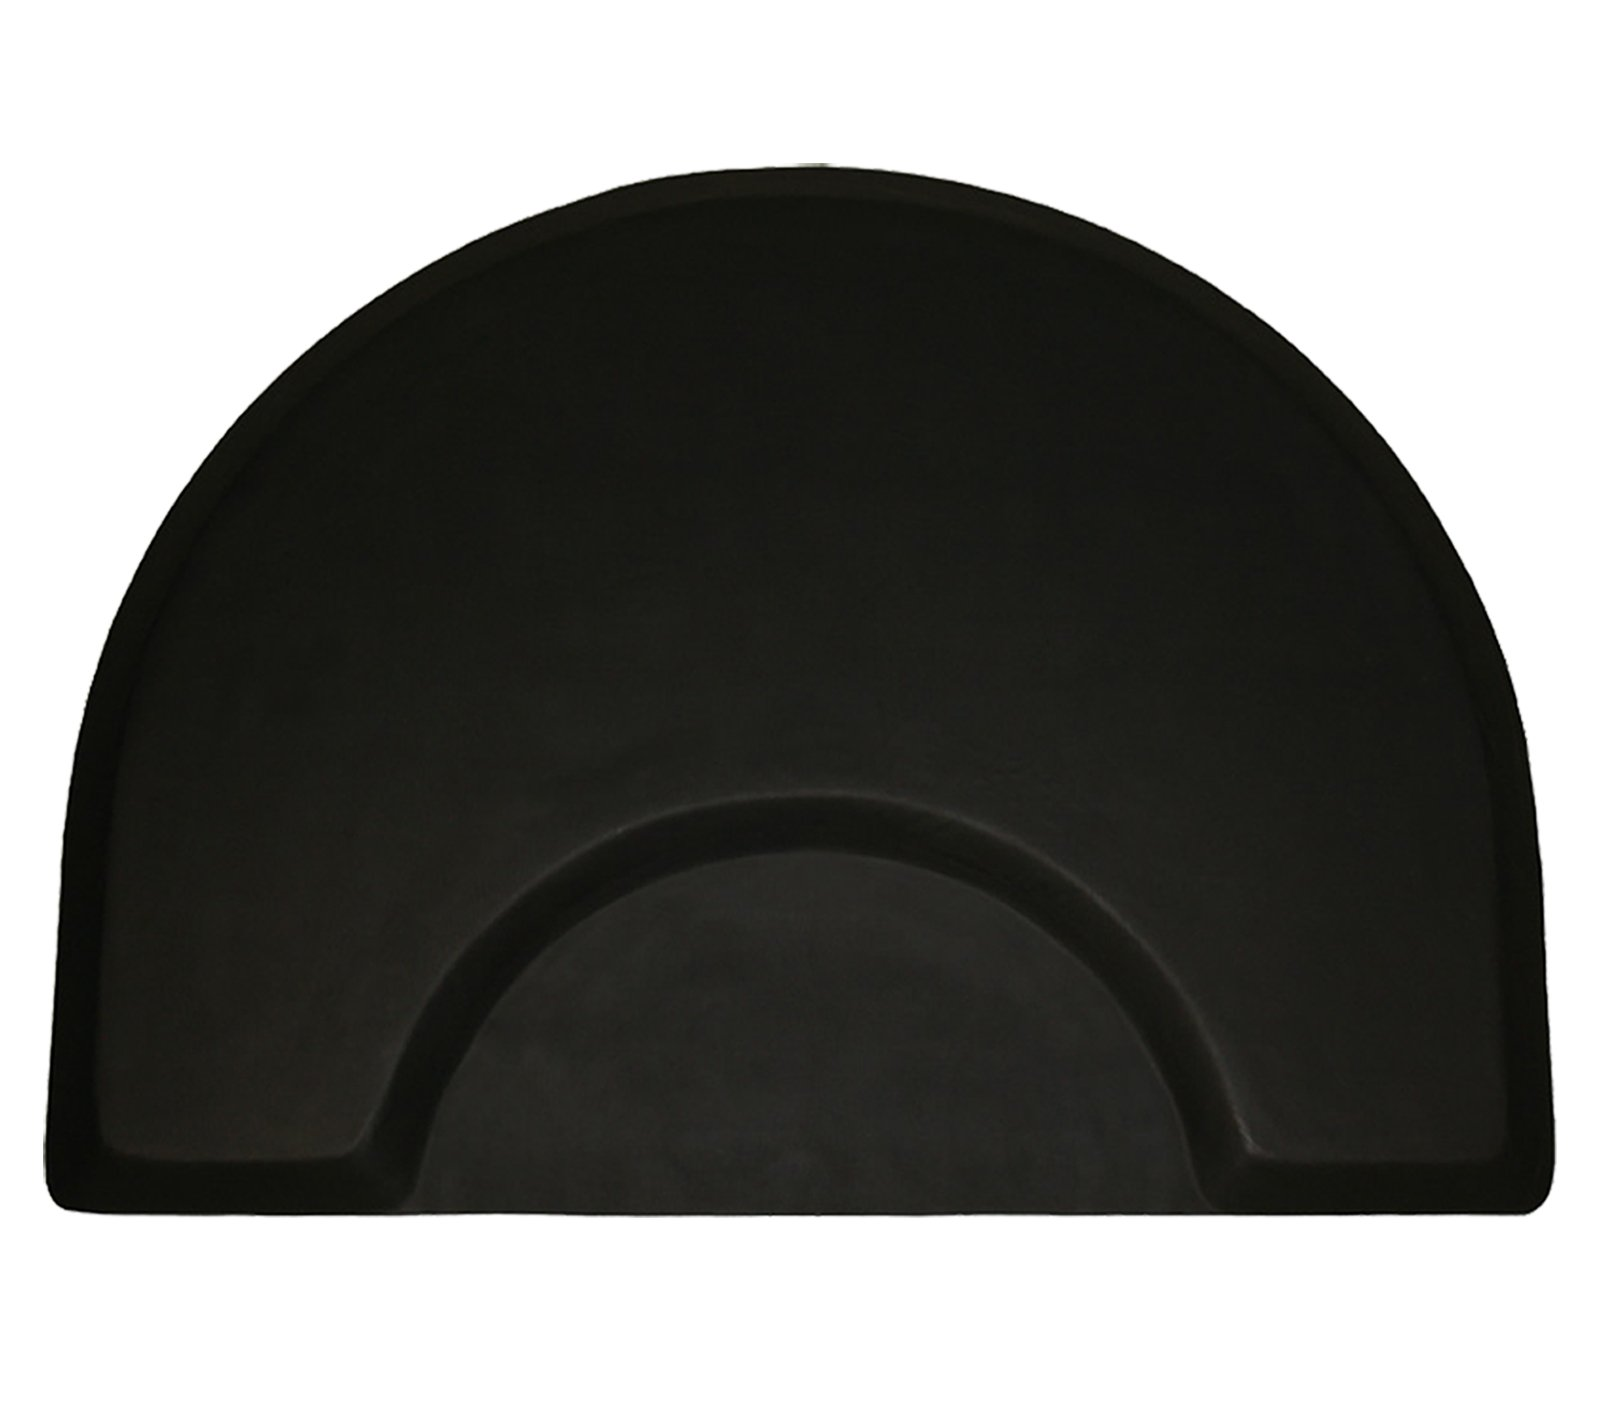 LCL Beauty 1/2'' Thick Professional Half-Round Waterproof Anti-Fatigue Barber Salon Floor Mat